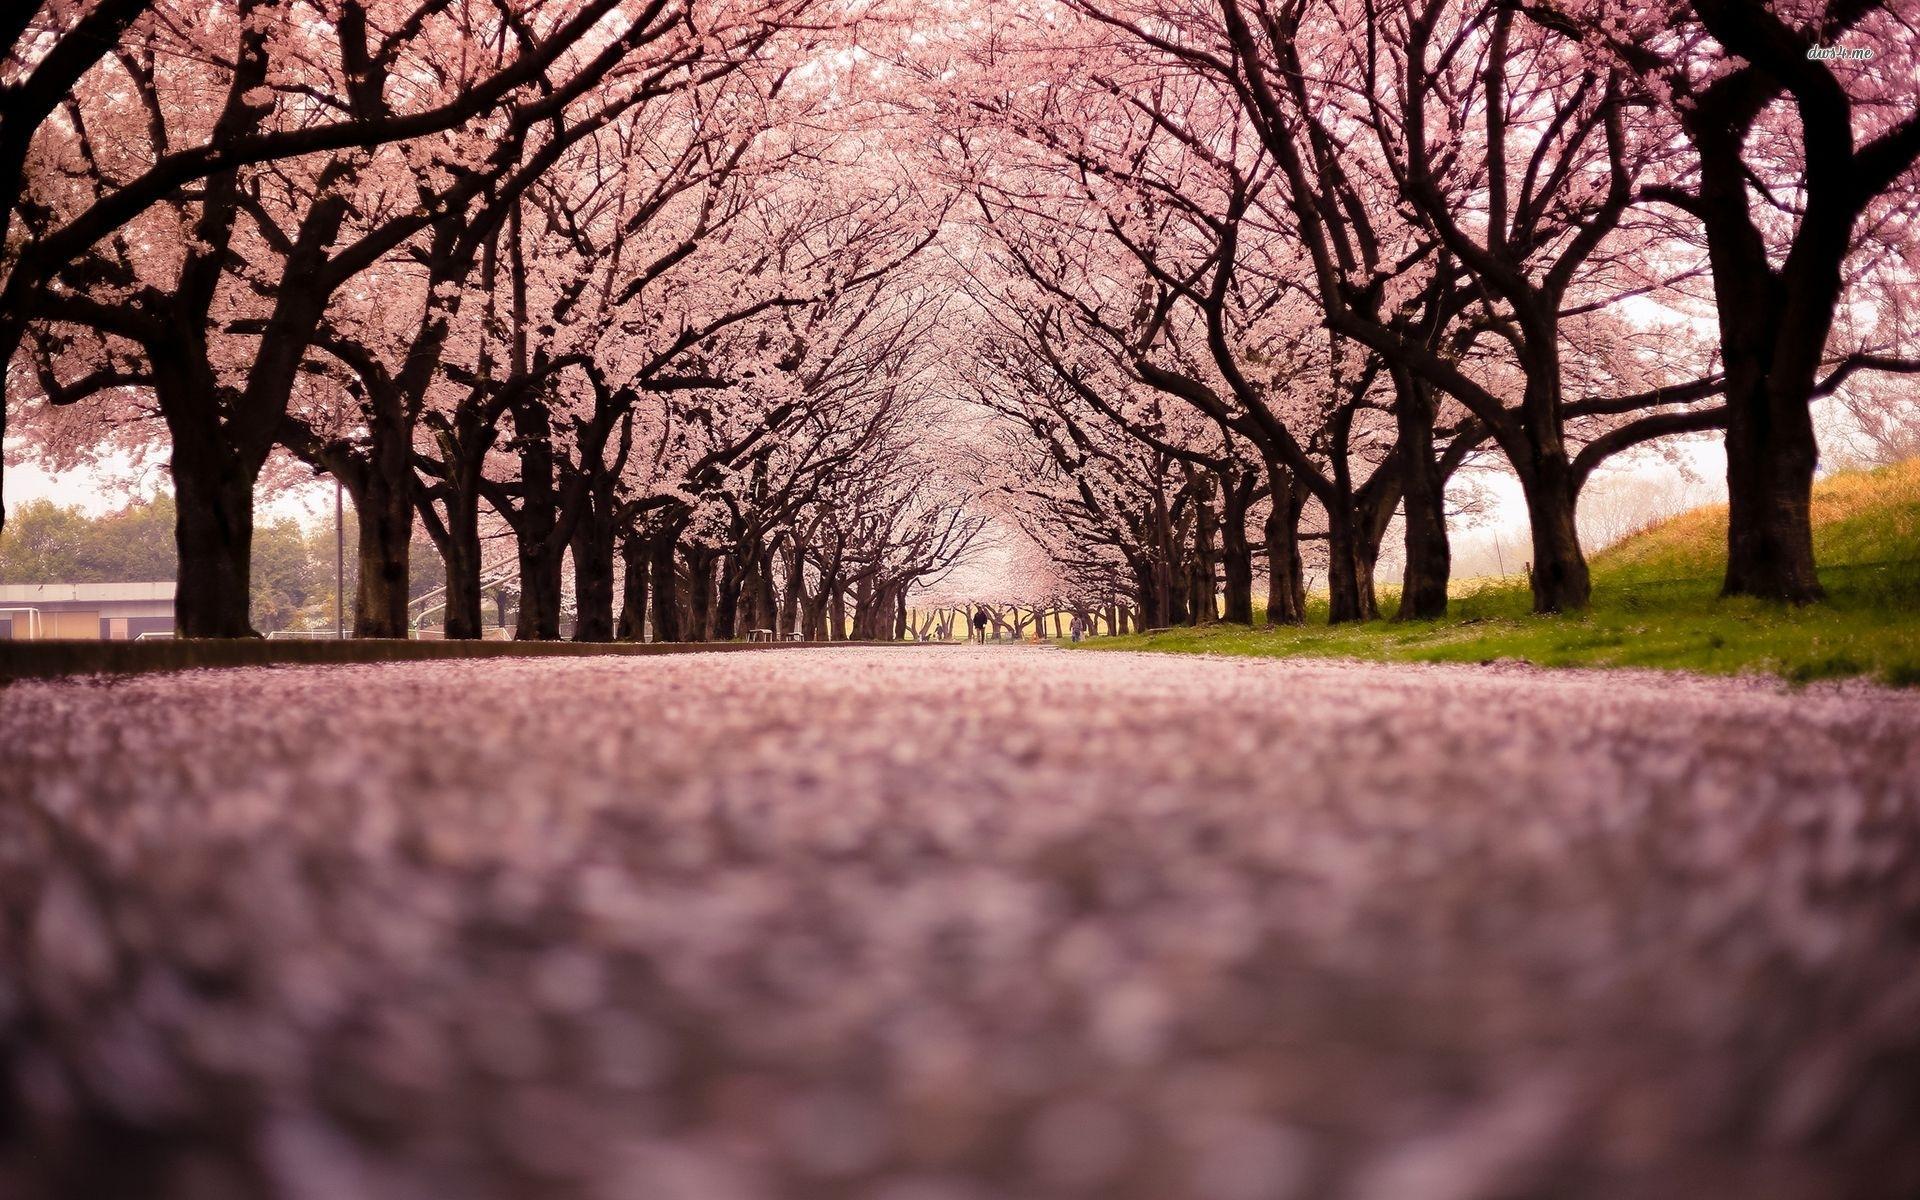 cherry blossom tree 16 hd wallpaper | modern asian artisan